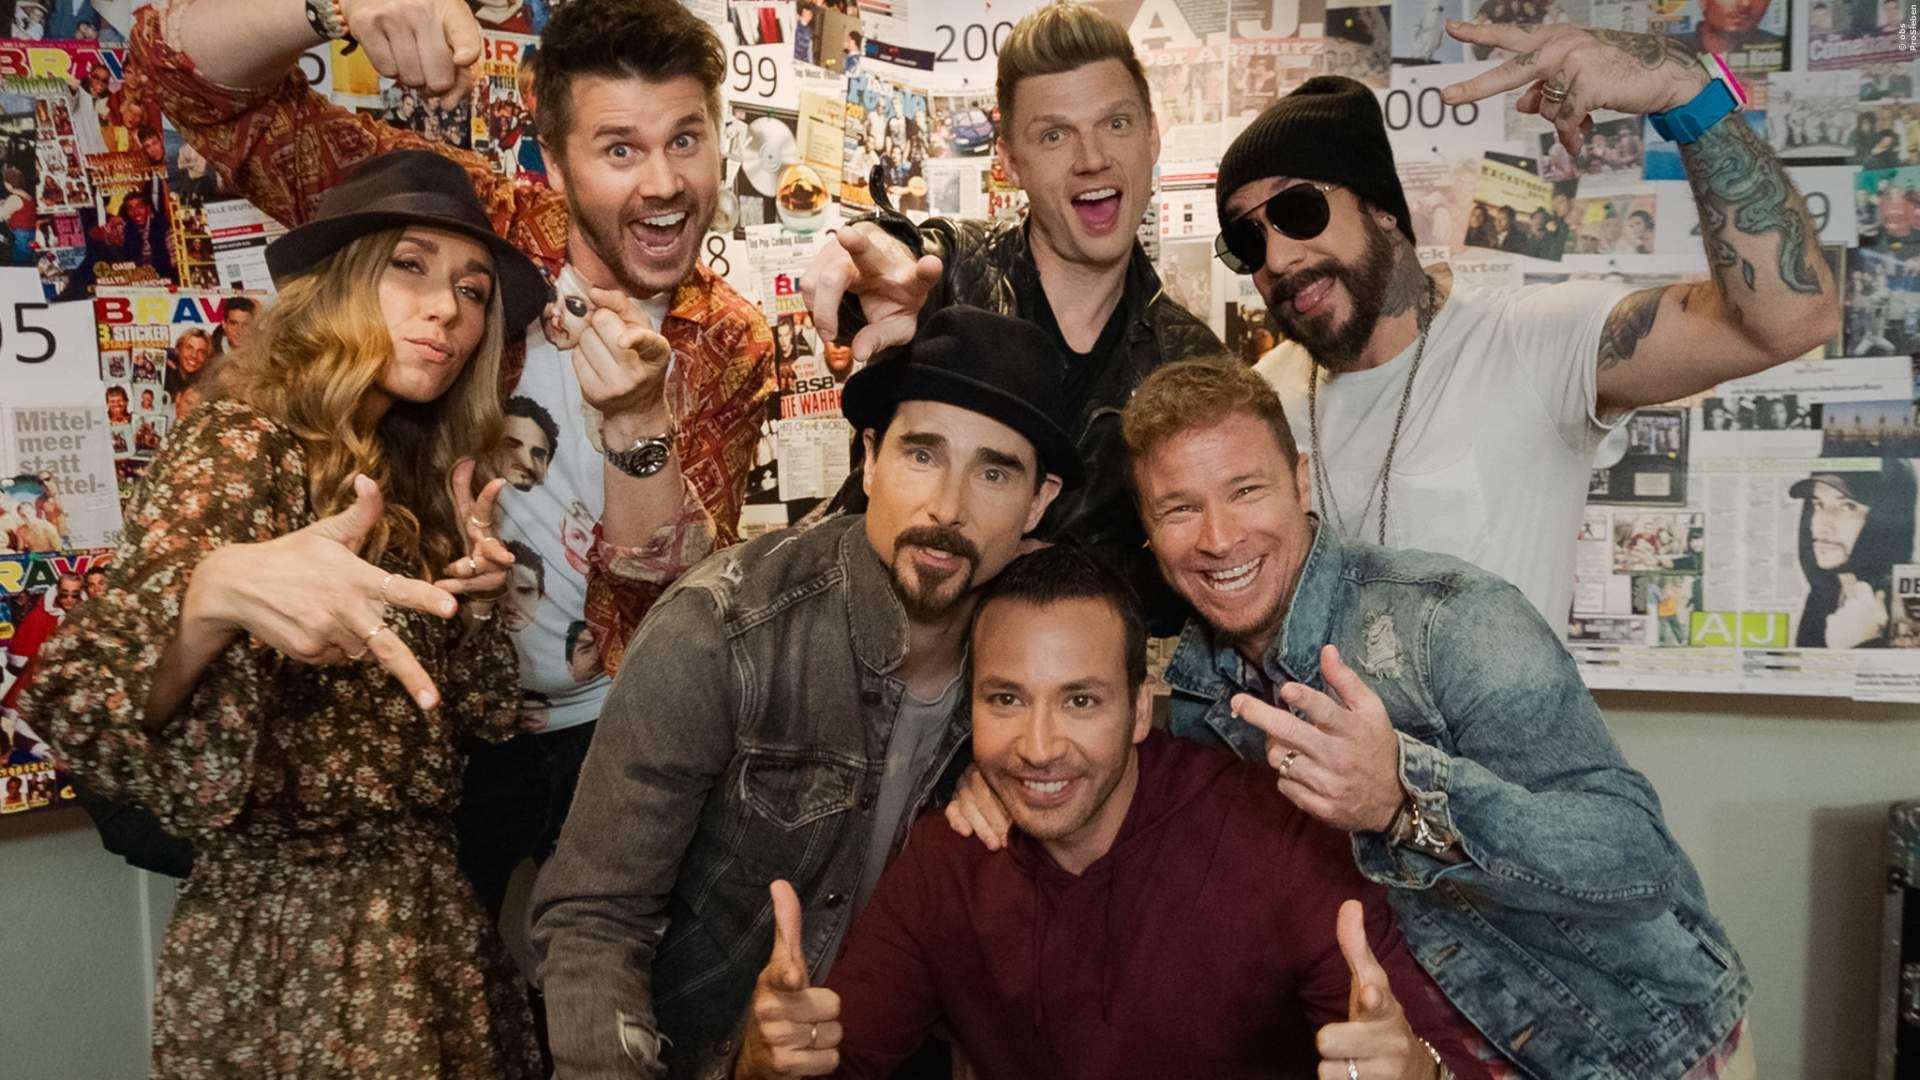 BackStreet Boys: So hart feiert ProSieben die legendäre Band im Programm